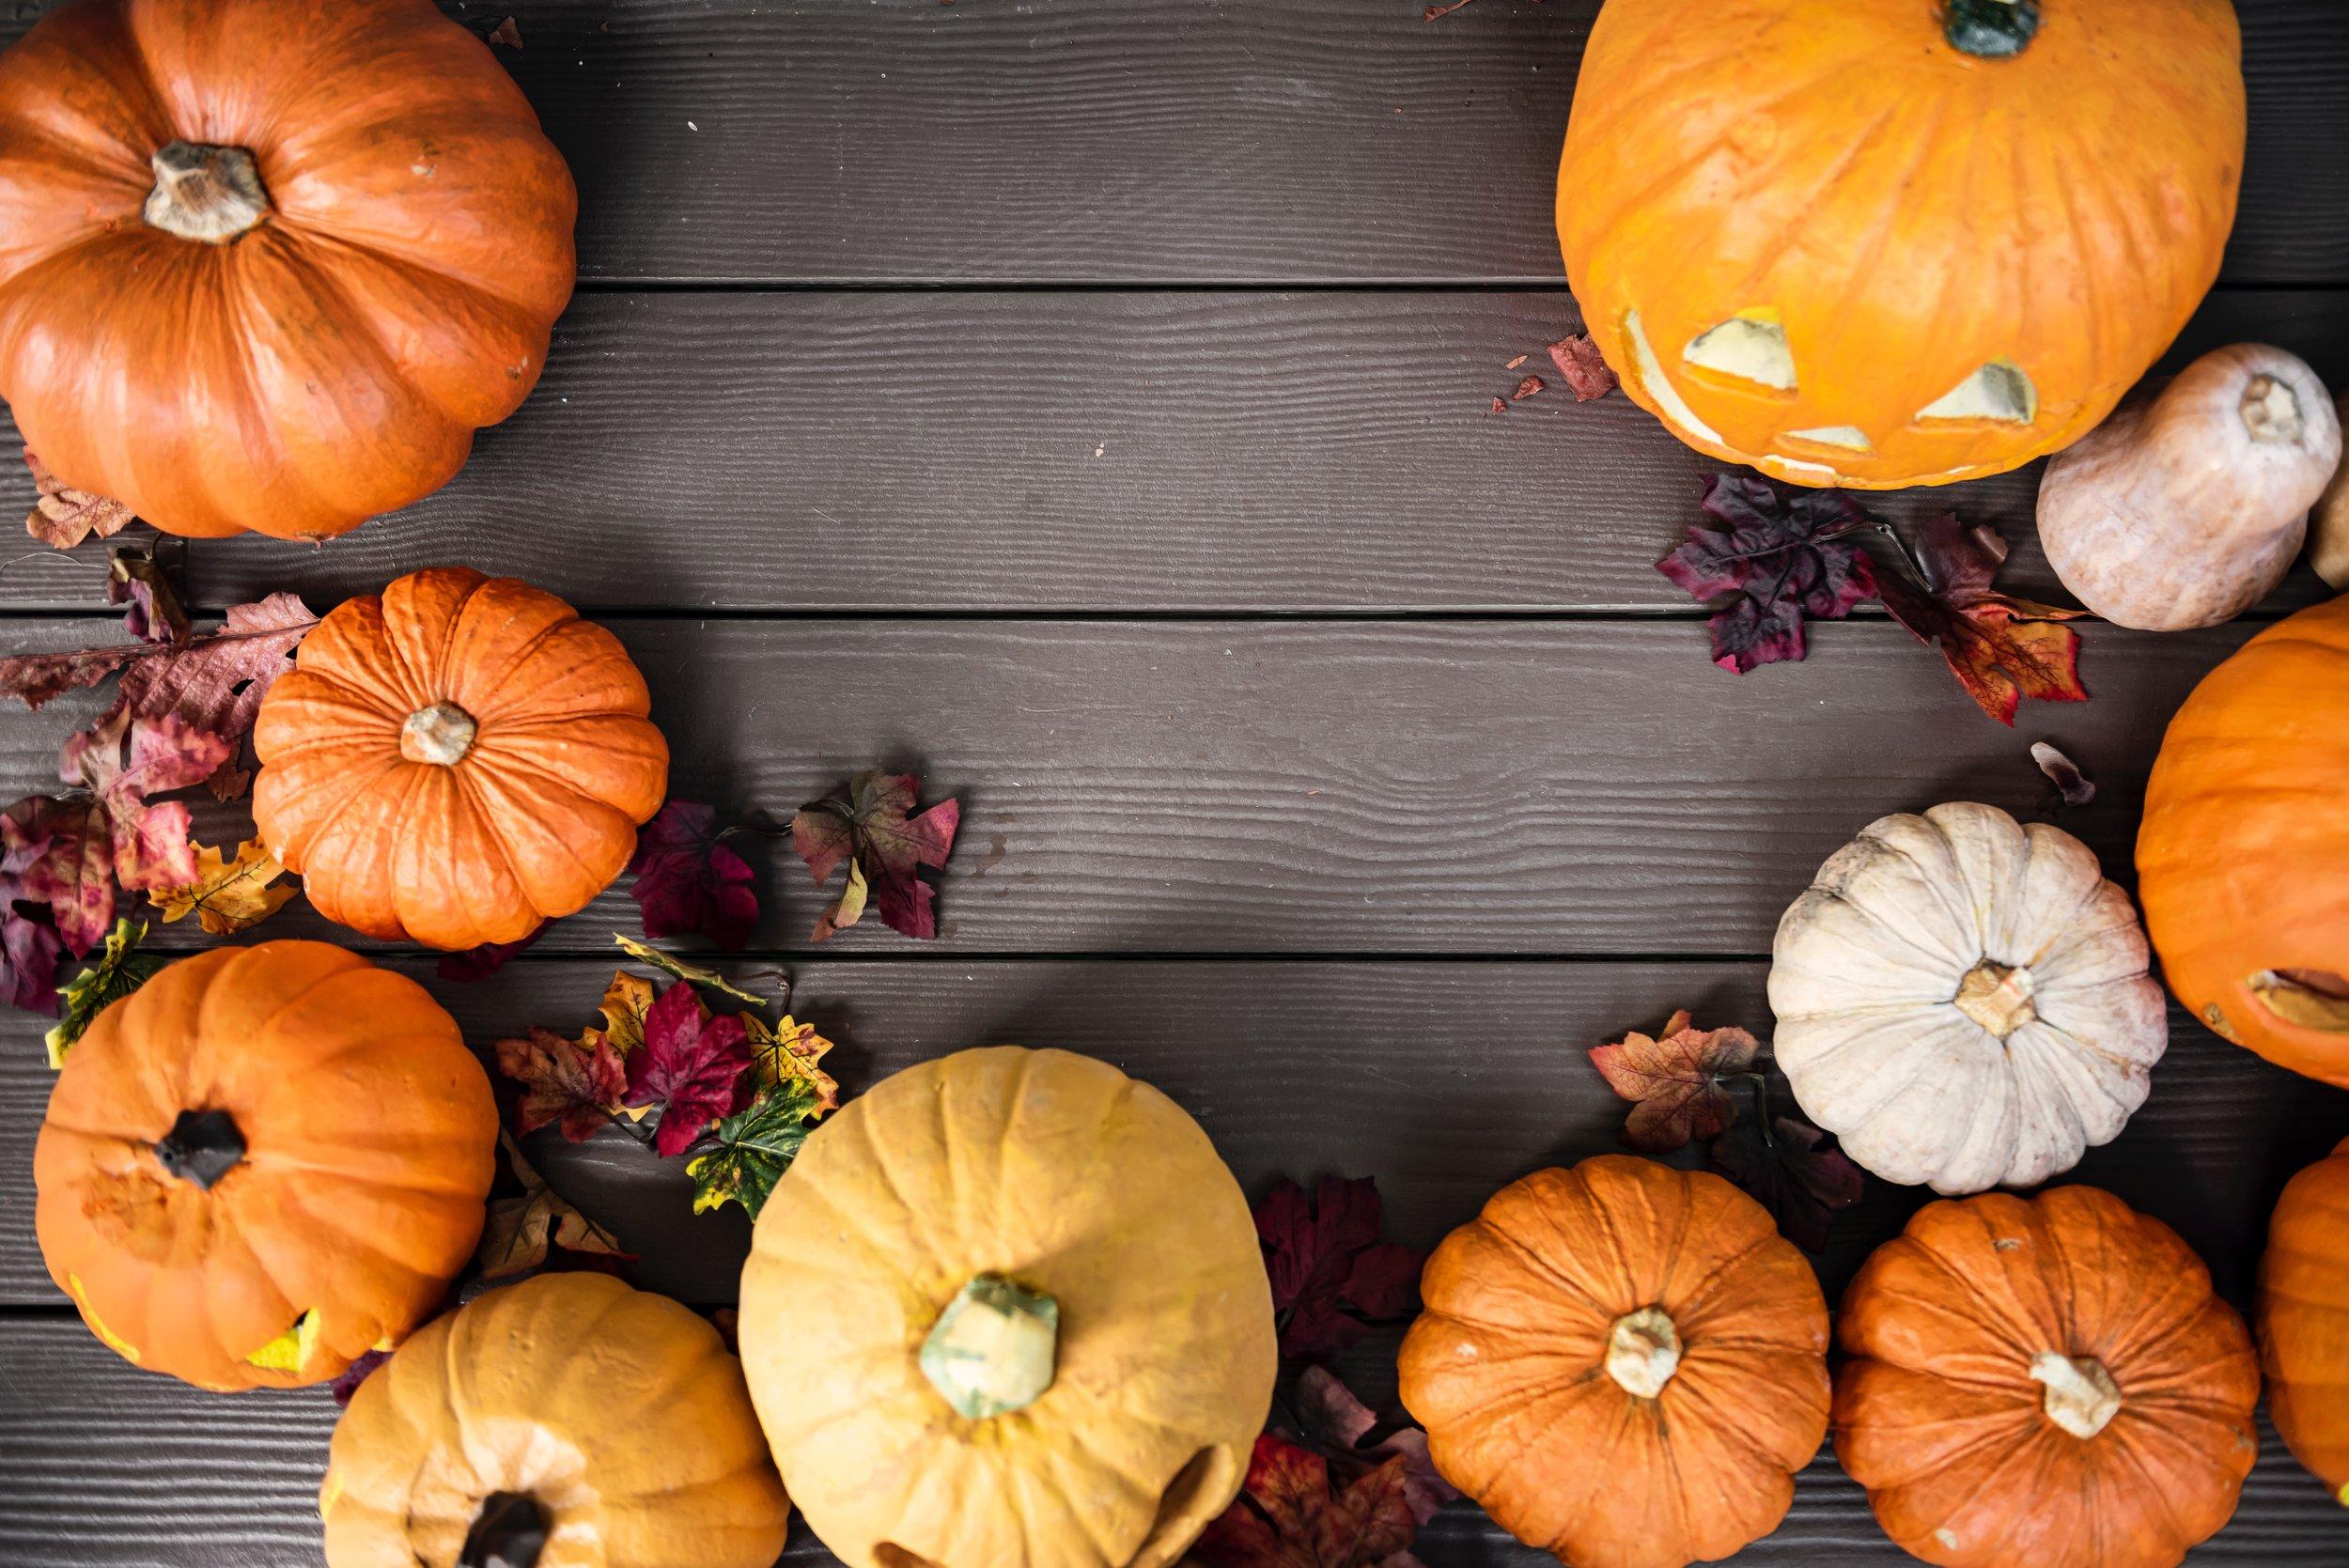 pumkins Halloween rawpixel-800841-unsplash.jpg